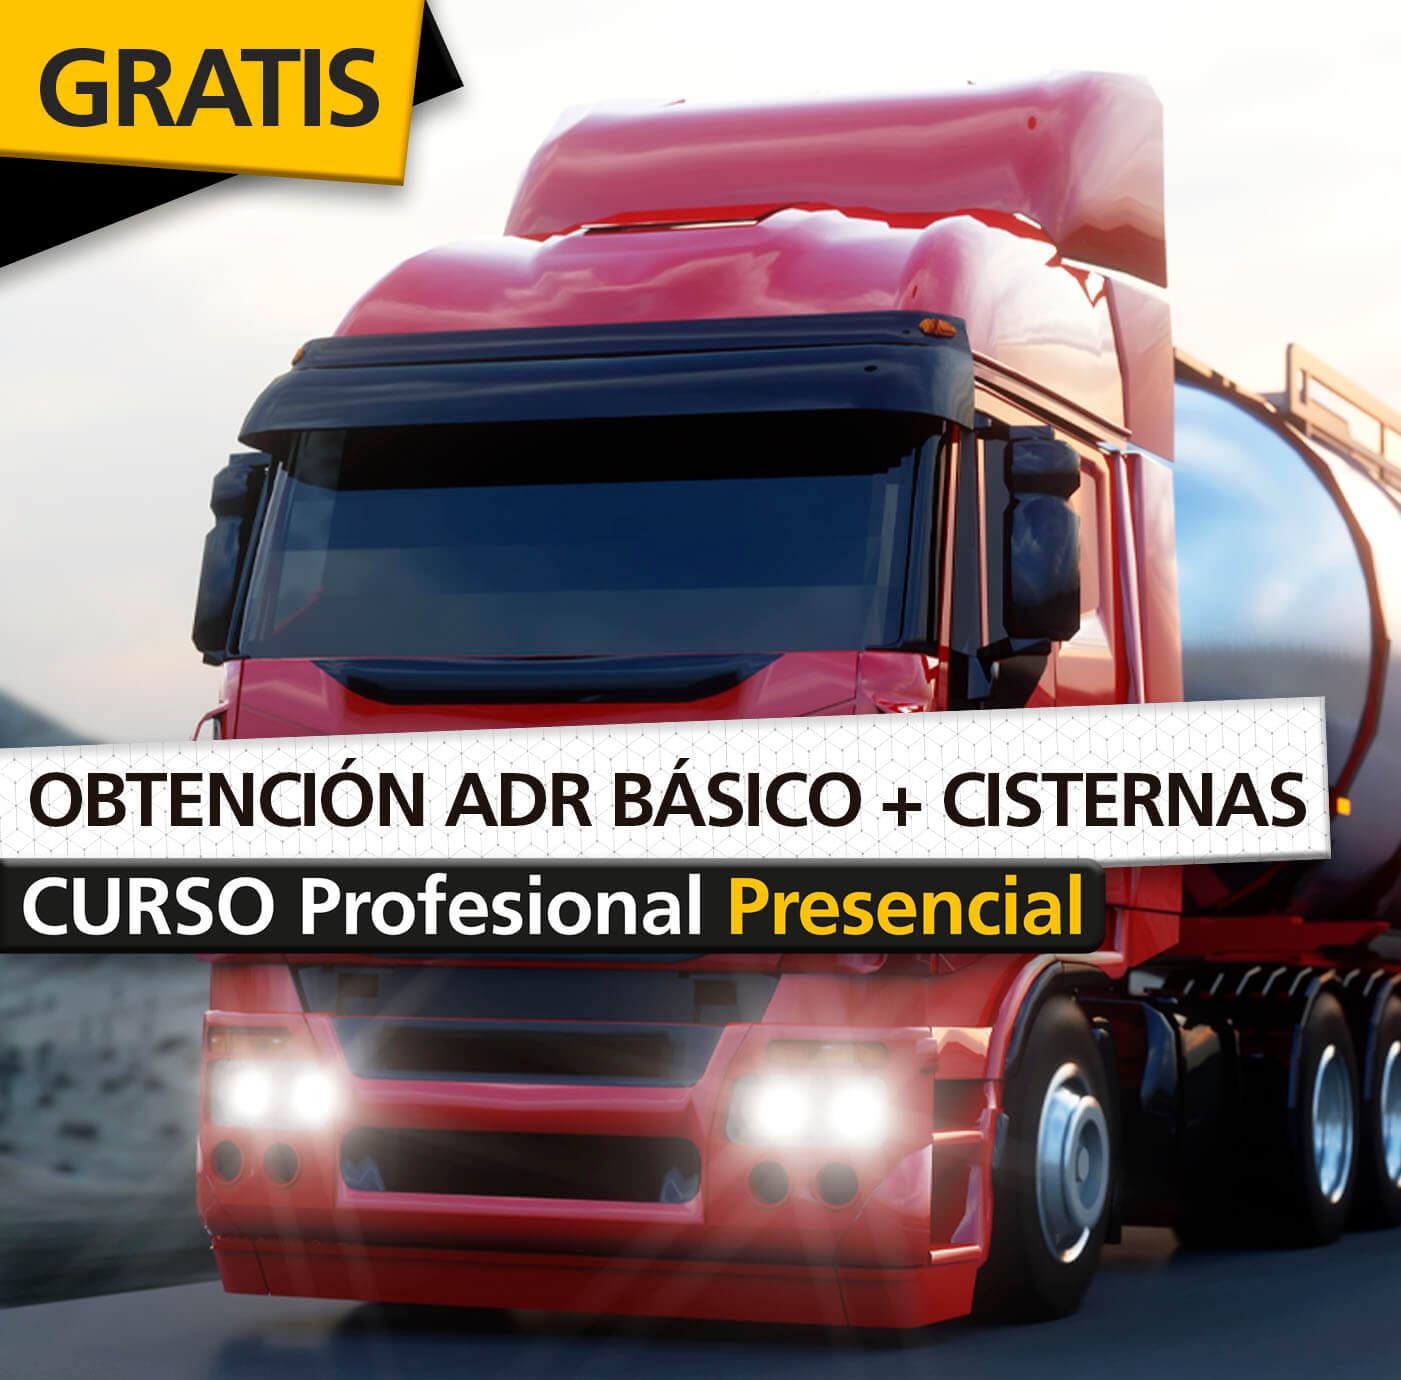 C-Obtencion-ADR-Basico-Cisternas-SliderSlider_Cuadrado_movil